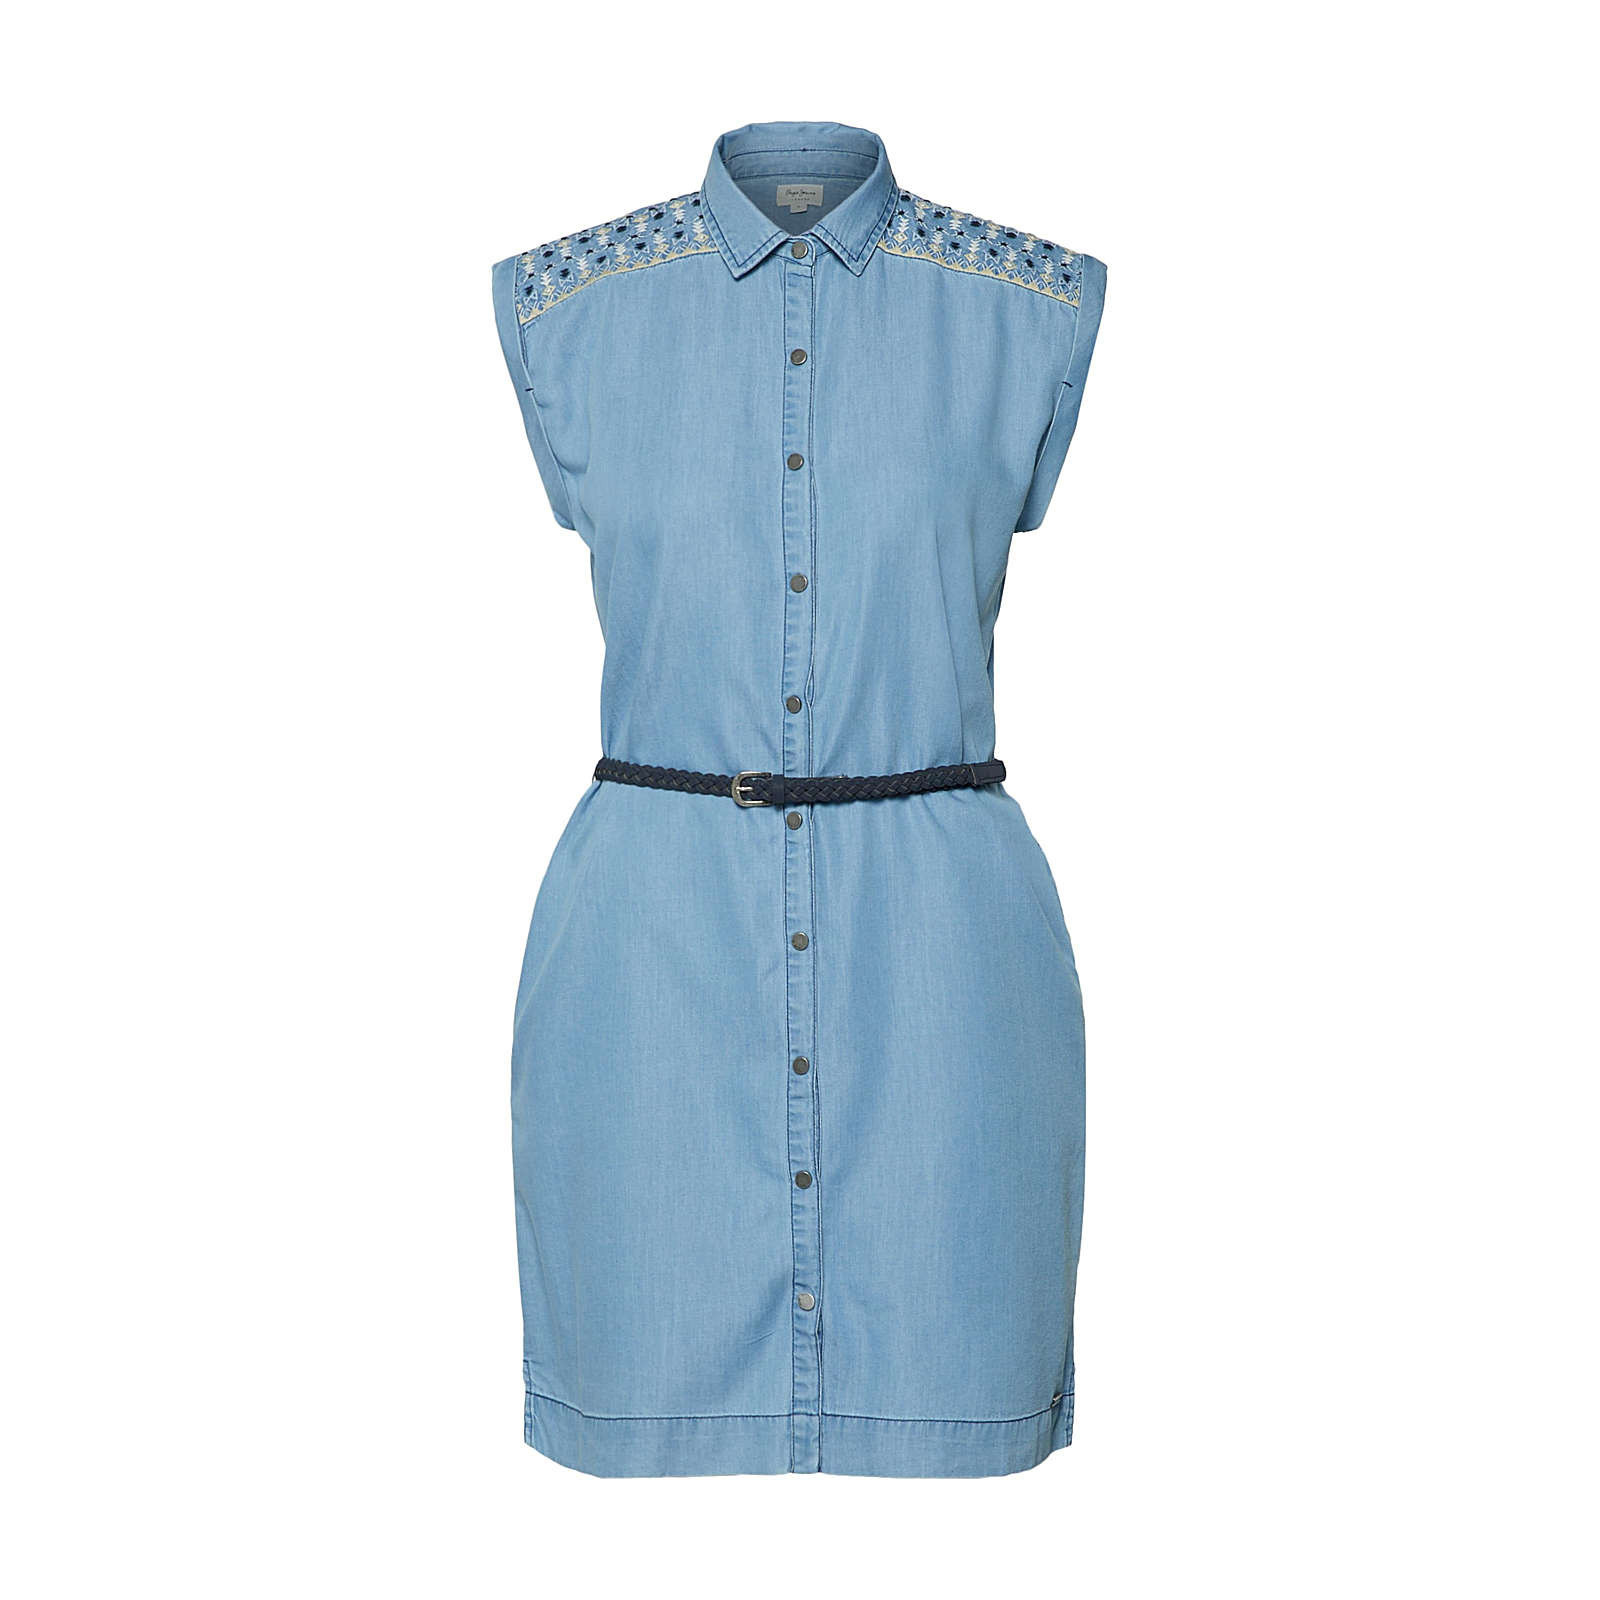 Pepe Jeans Blusenkleid Dora Blusenkleider blau Damen Gr. 38